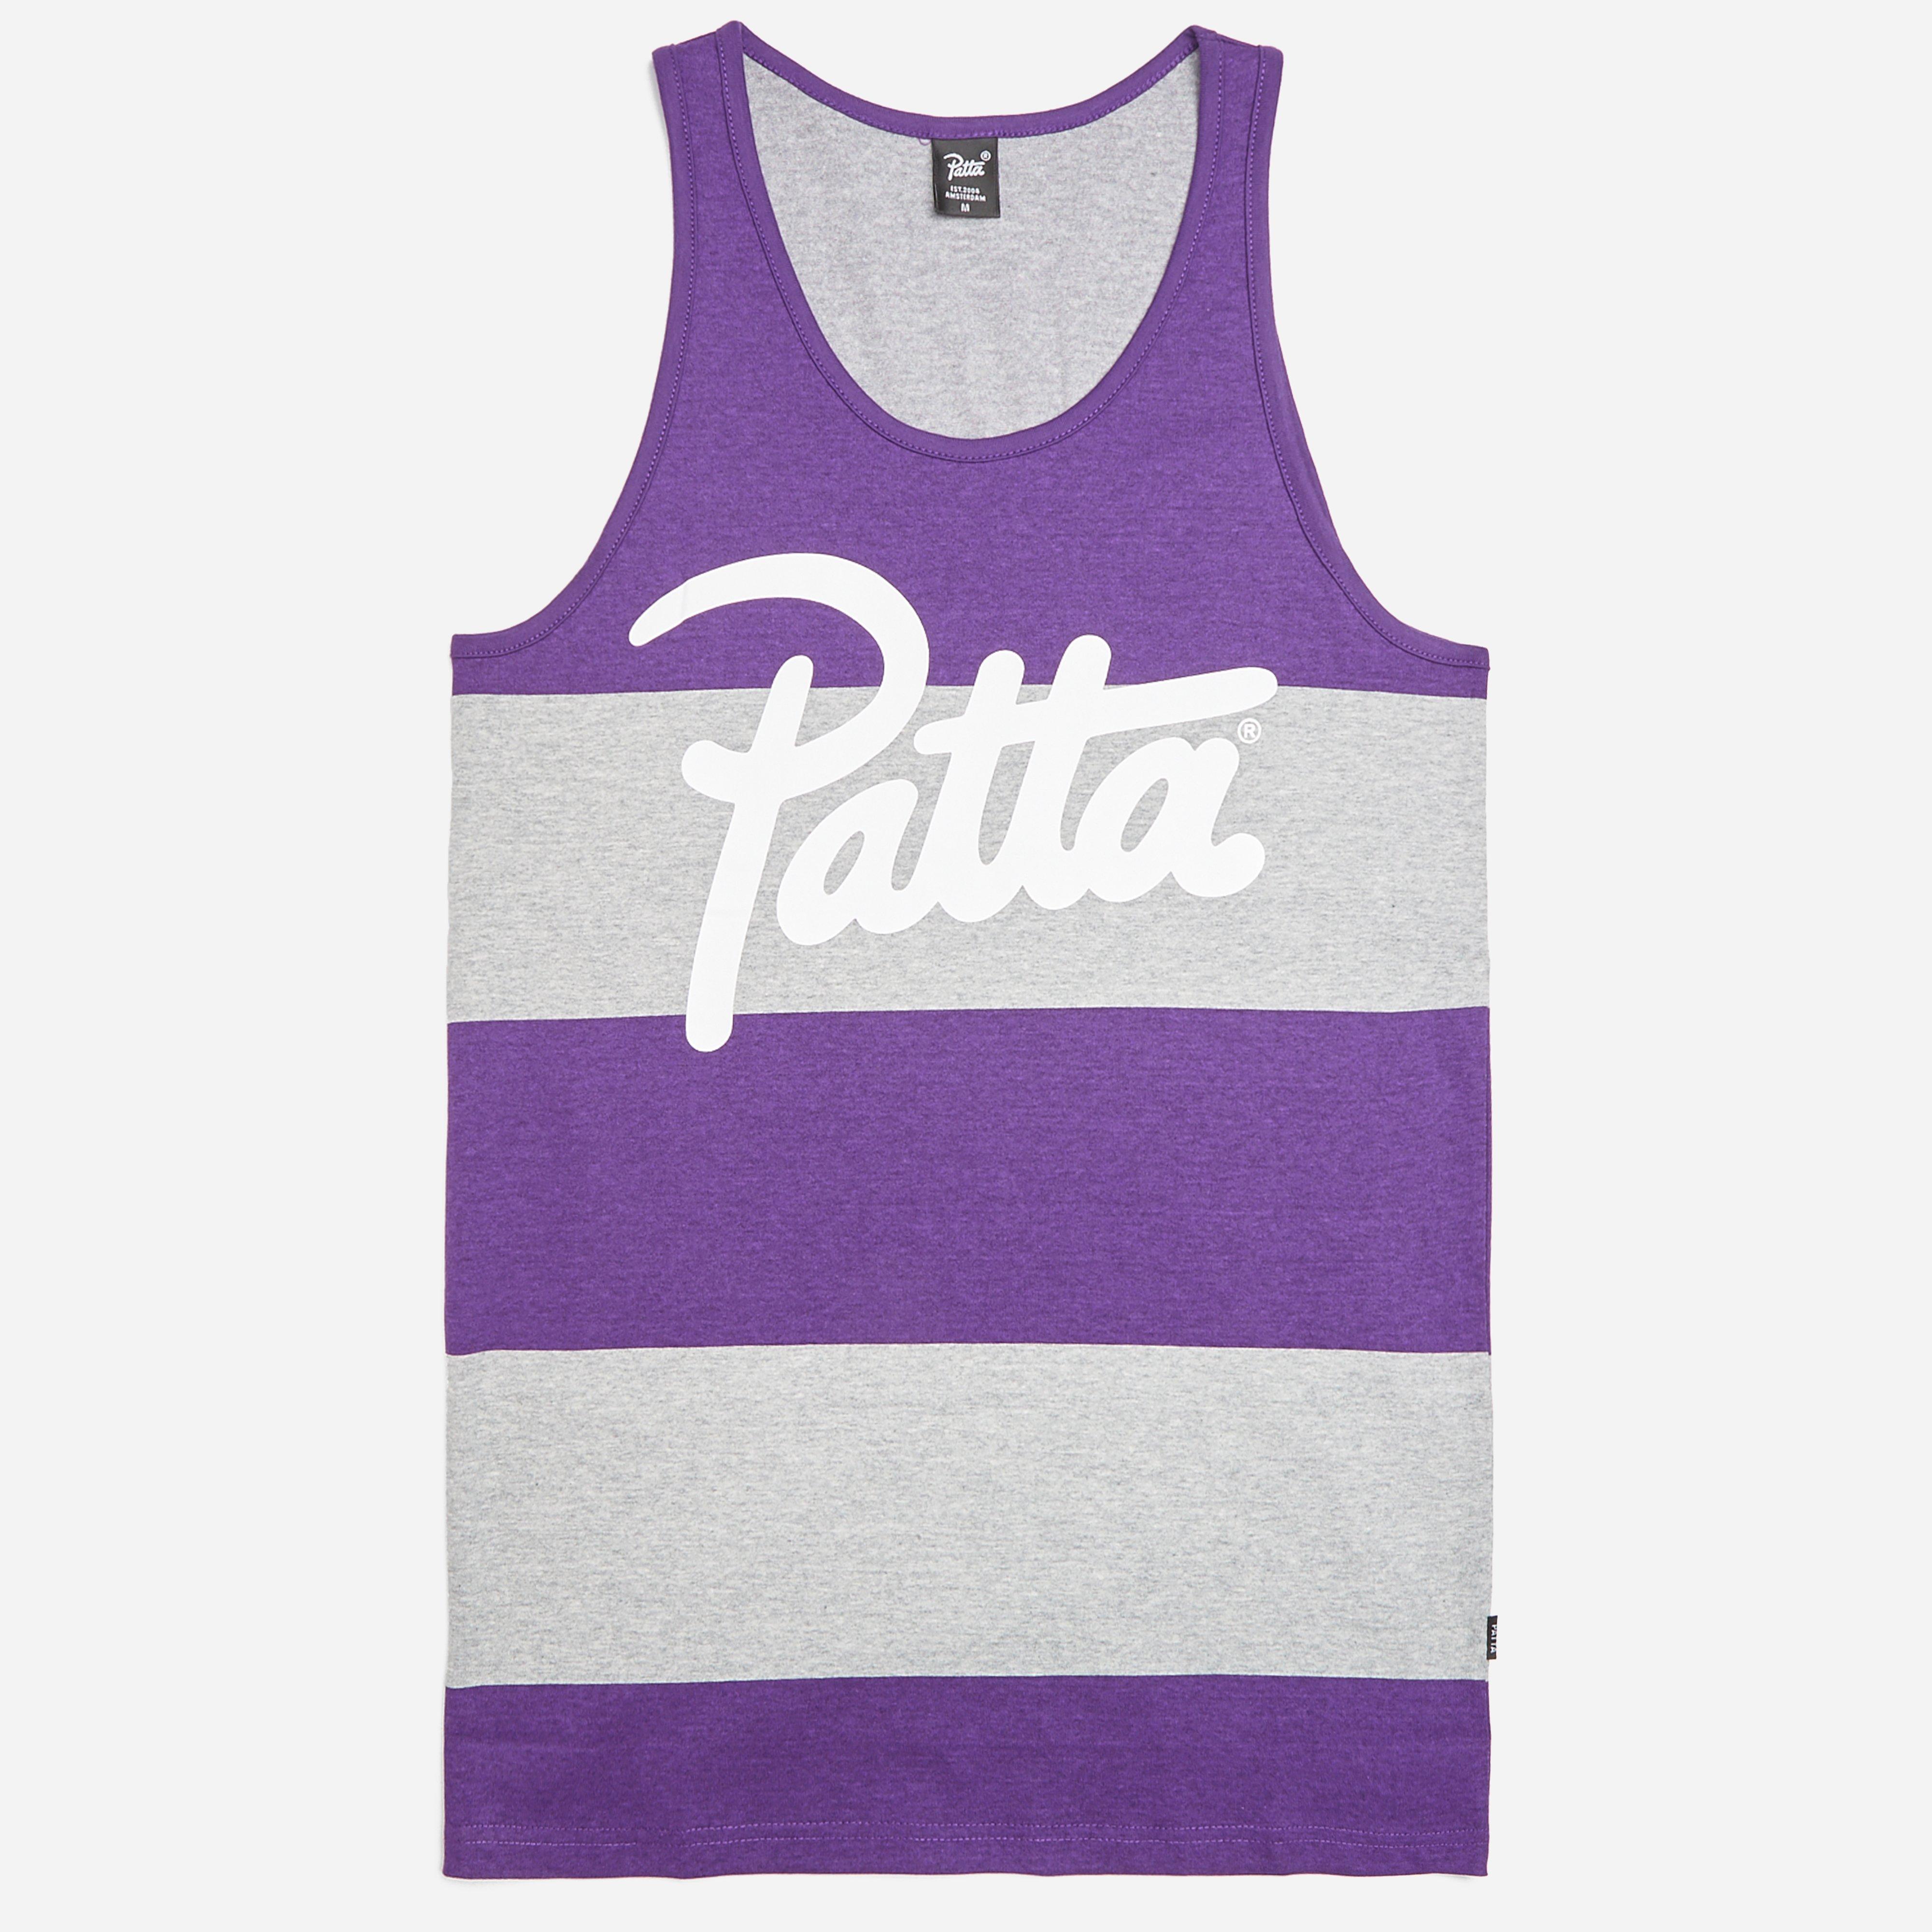 Patta Script Logo Tanktop